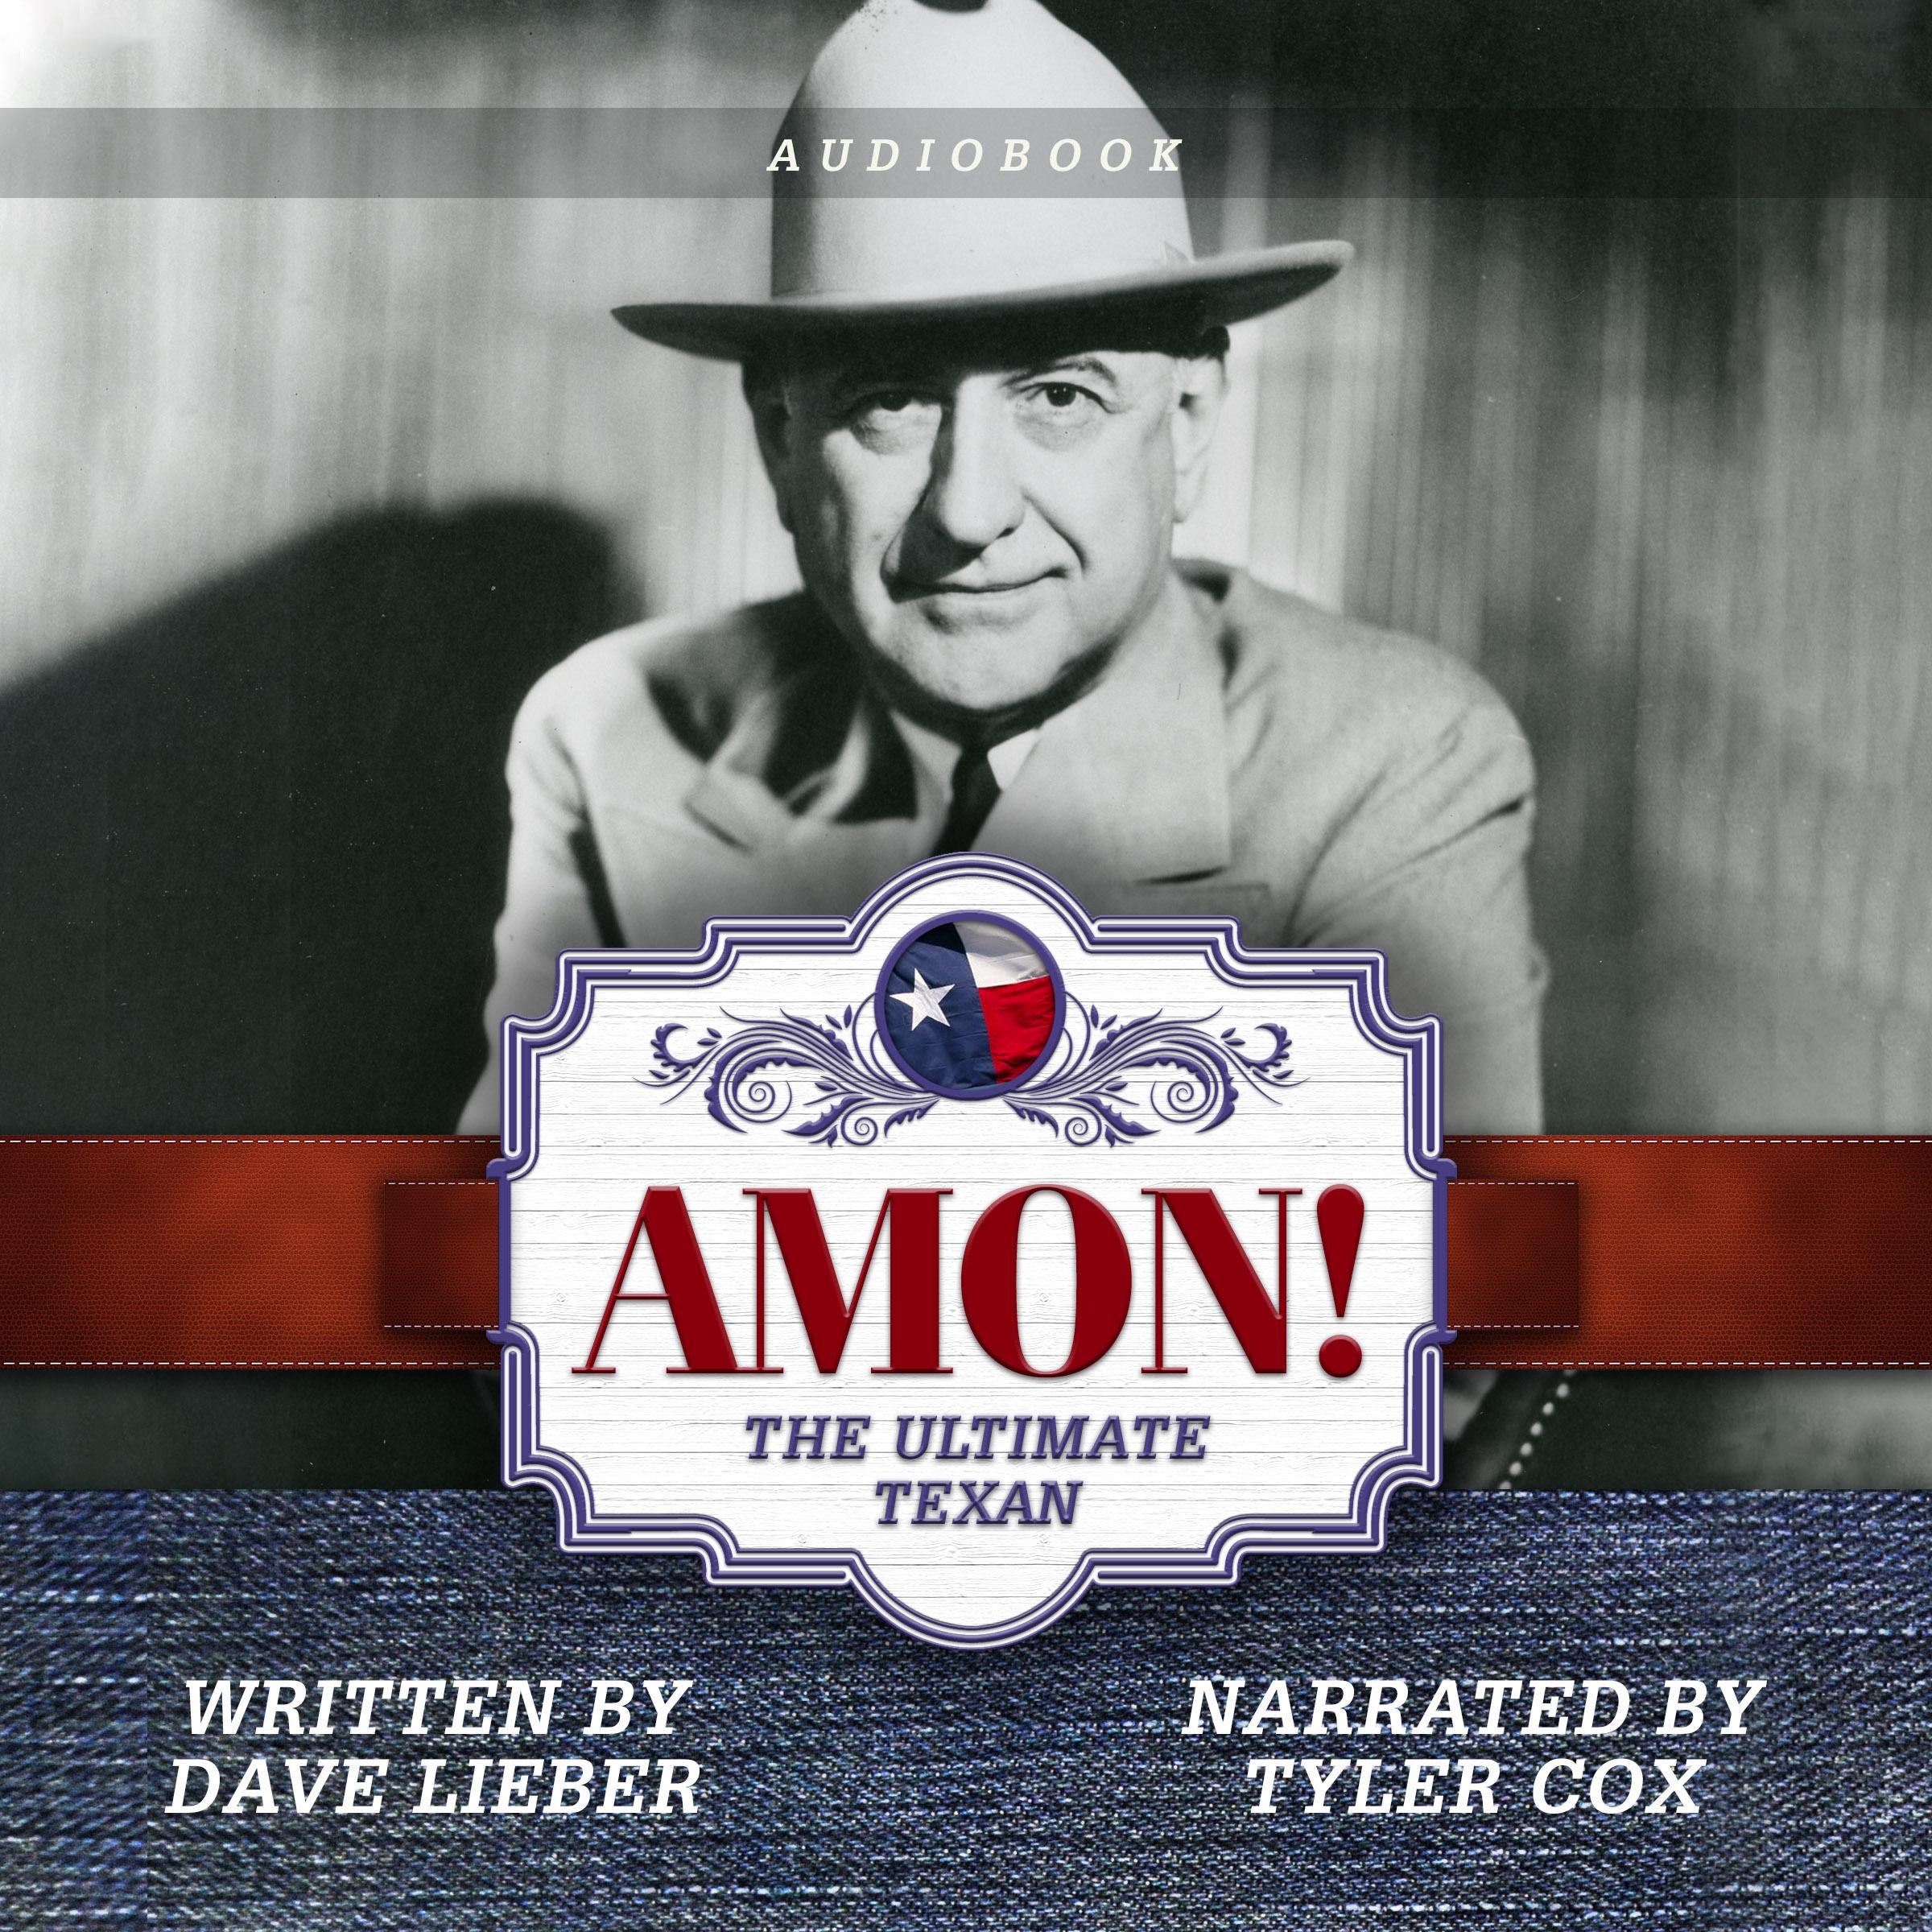 Amon Audible cover final.jpg